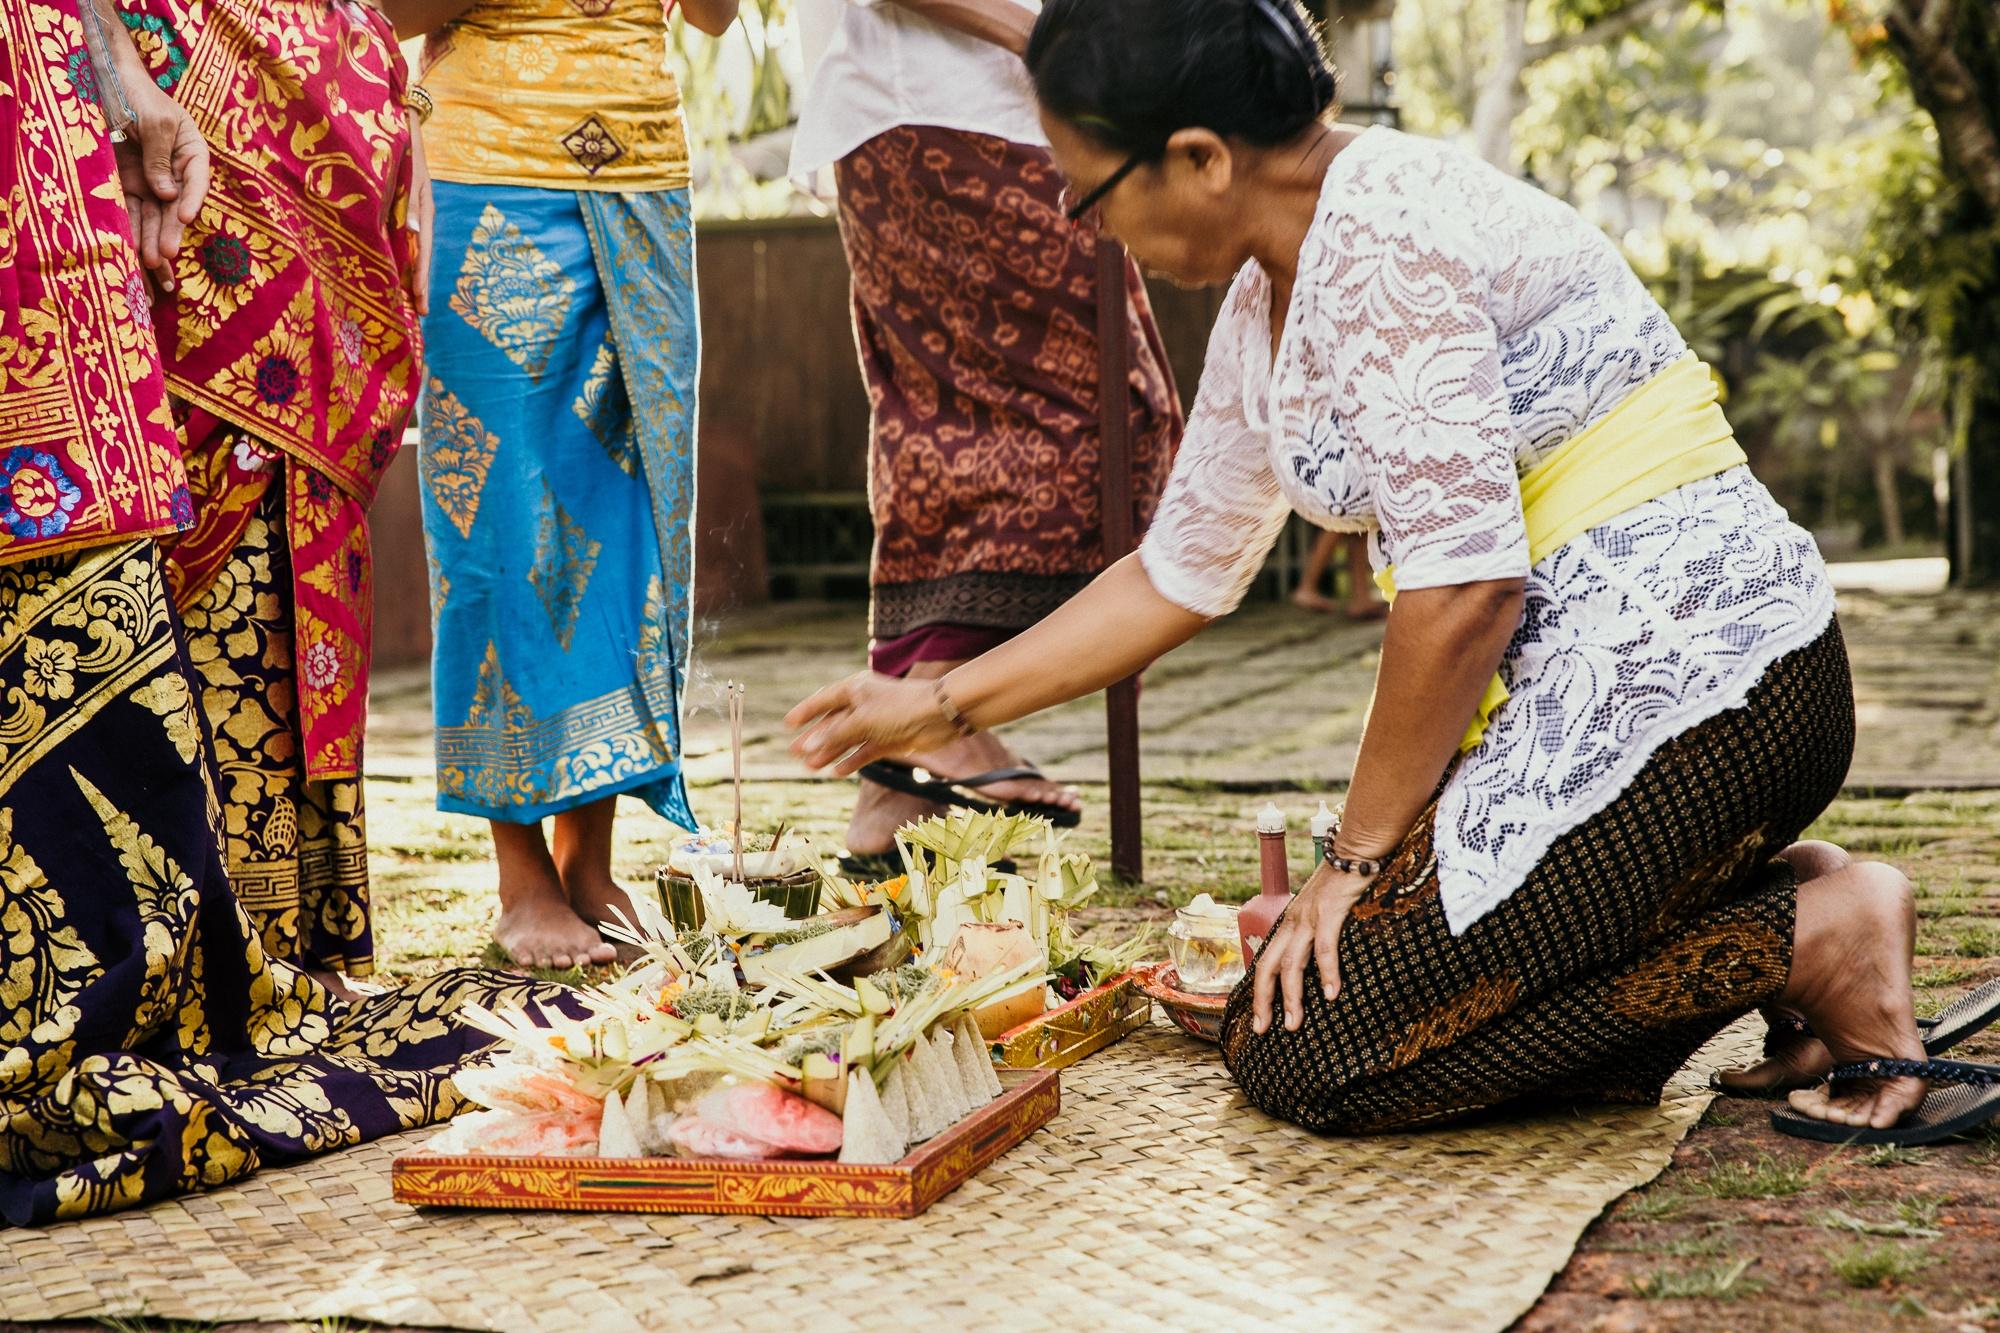 INDONESIA - ARGAZKI MAHATU, Photography & films.